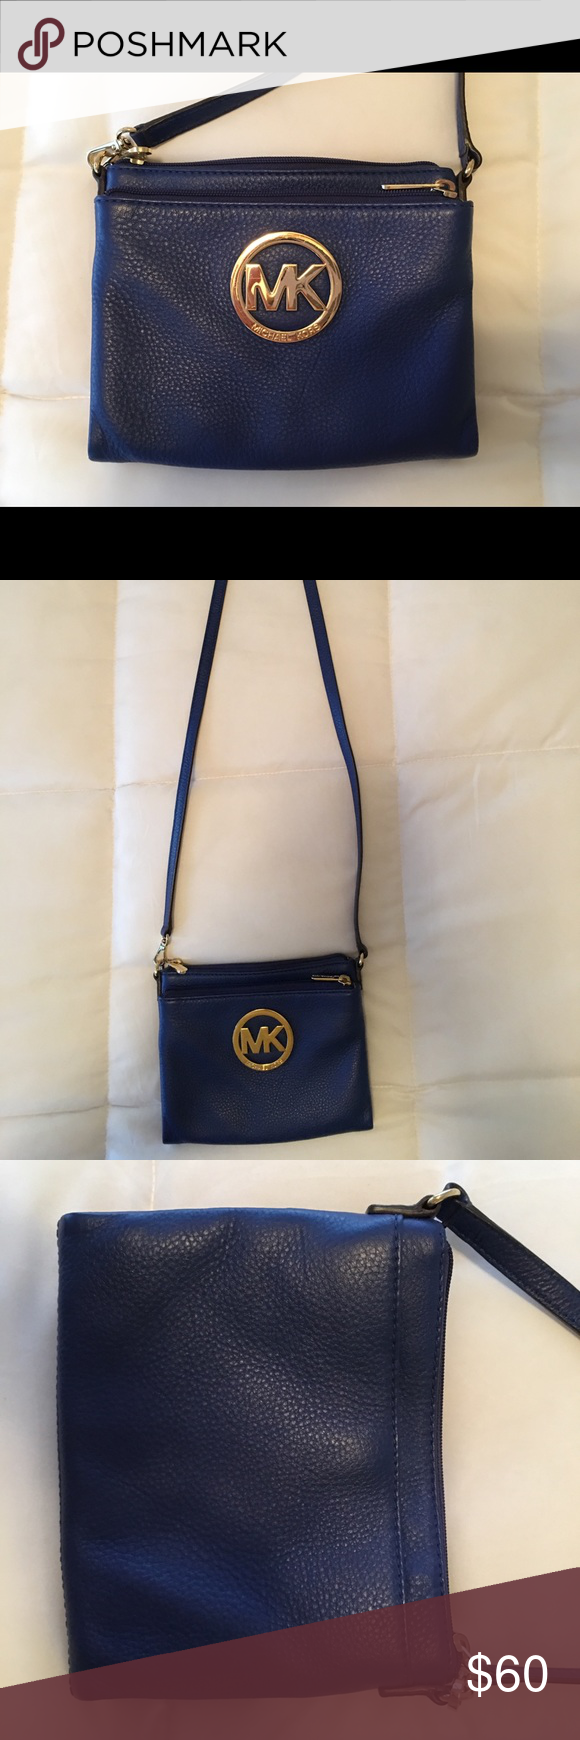 ebc42fa39b6a AUTHENTIC Michael Kors crossbody bag (navy gold) Super cute navy MK  crossbody bag